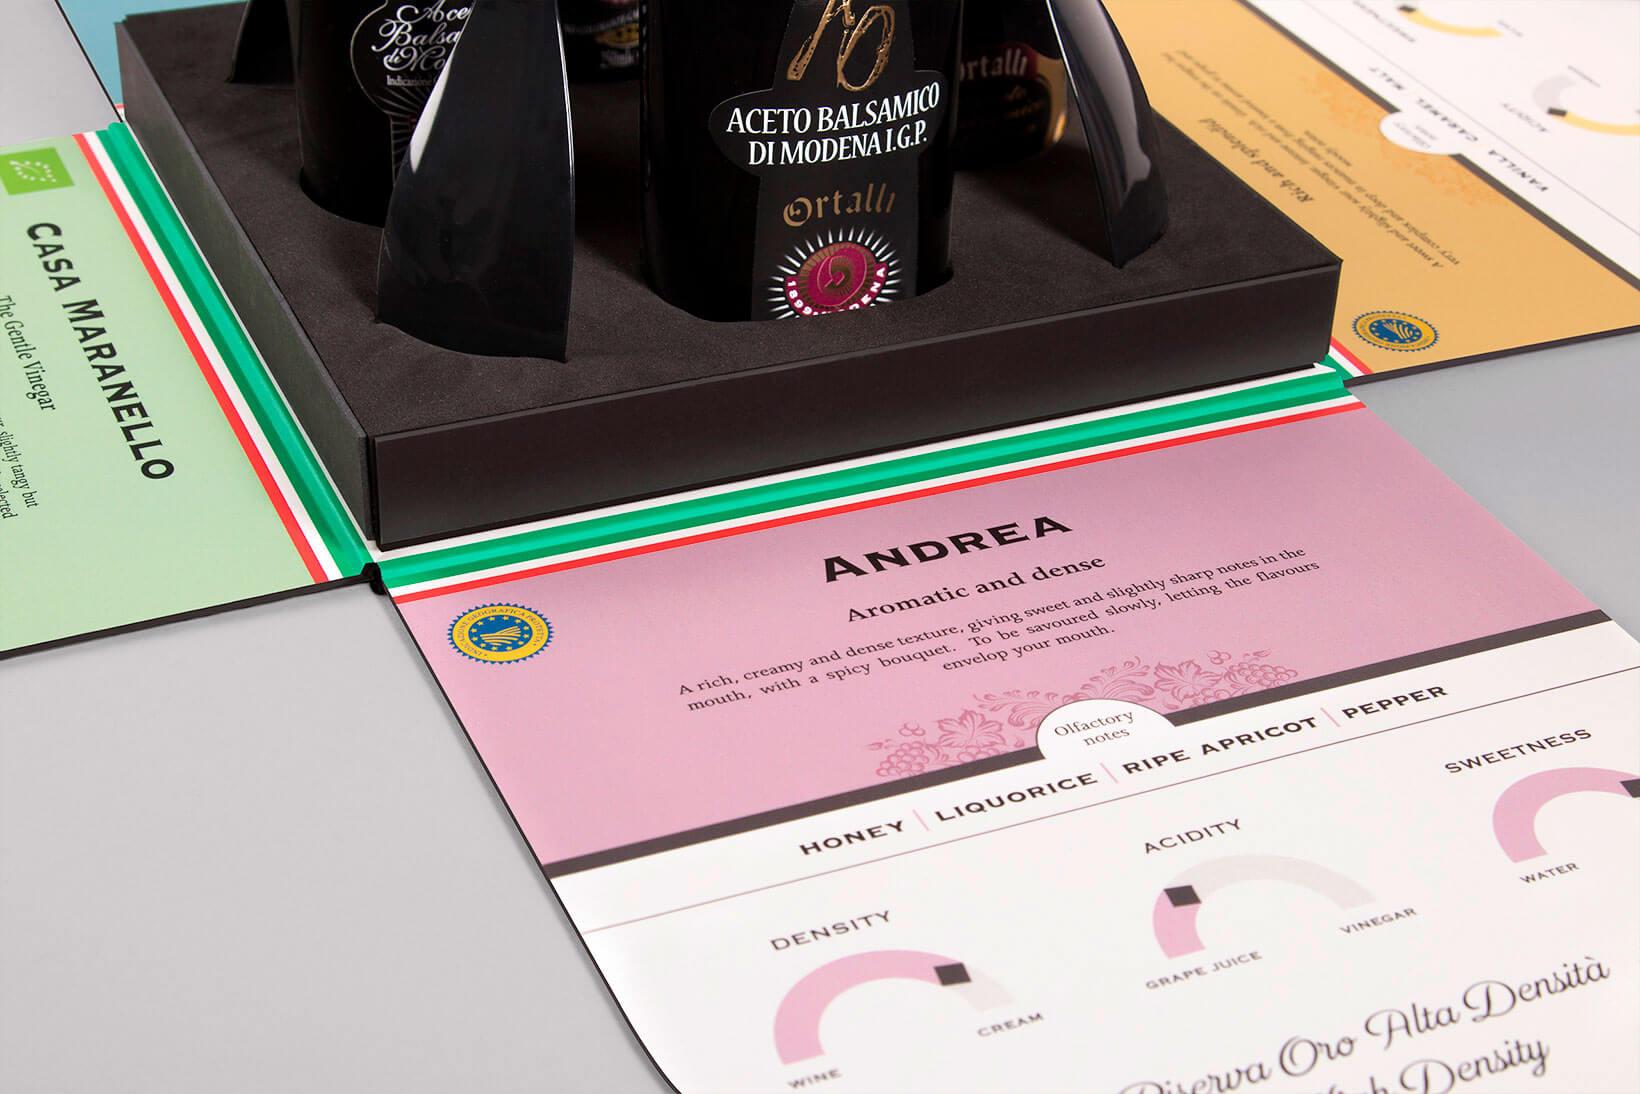 Detalle del selling kit diseñado para Ortalli